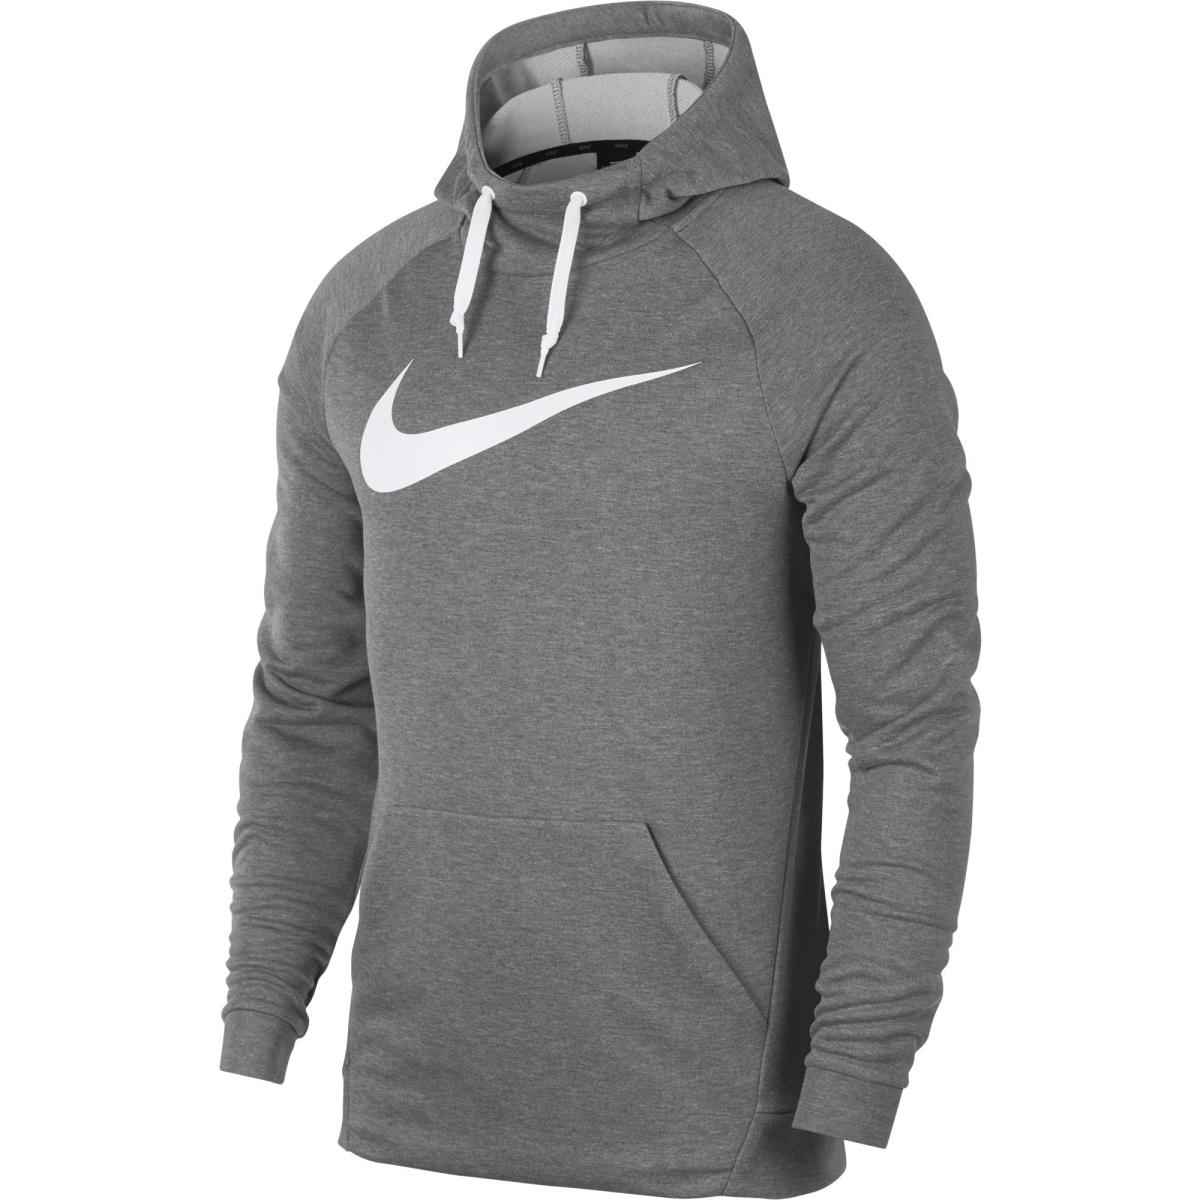 a25fcfe77b80 ... M Nk Dry Hoodie Po Swoosh šedá S. -19%. Nike ...